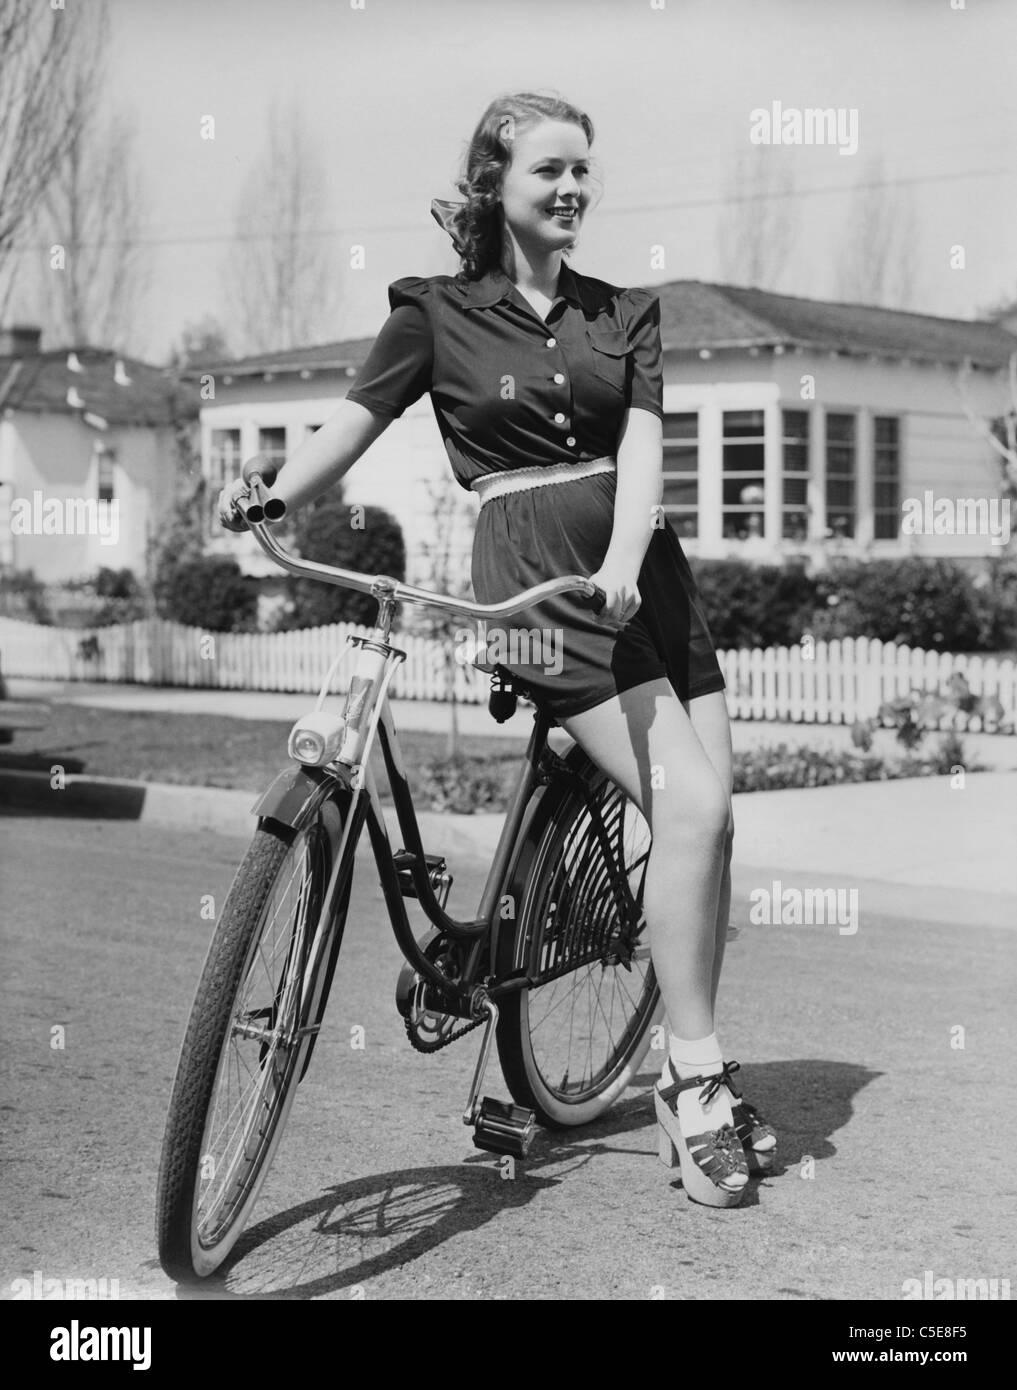 Bike riding - Stock Image